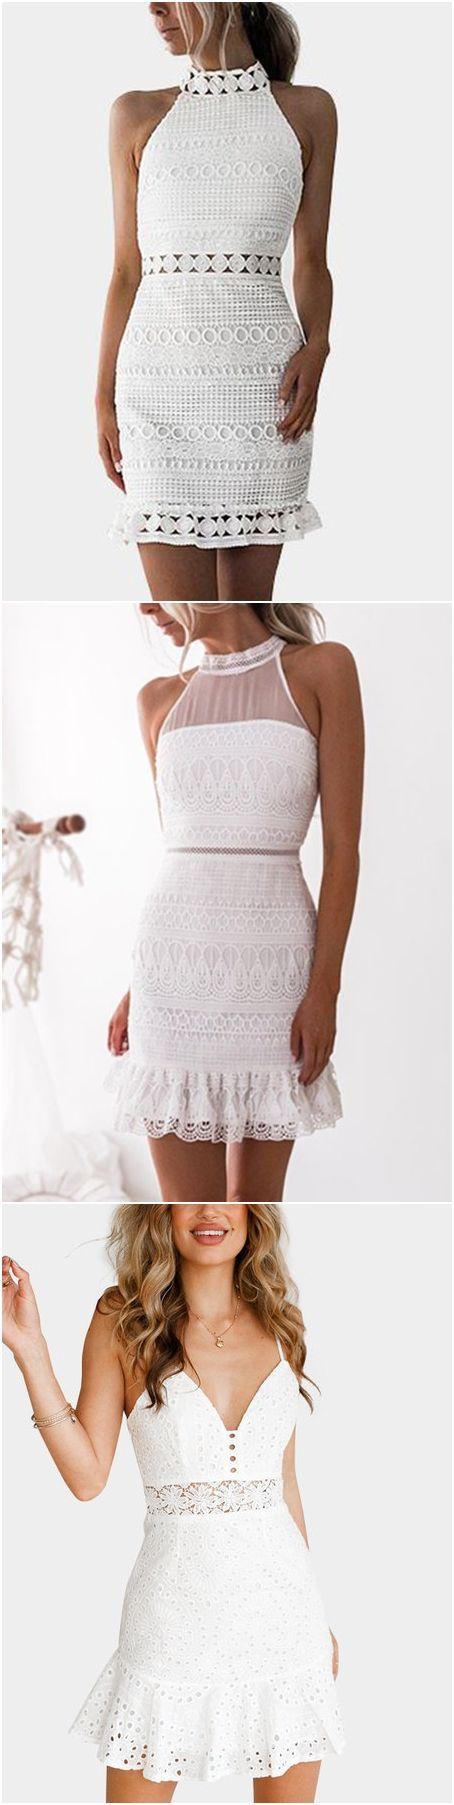 White Lowcout V-neck Criss-cross Back Delicate Lace Slip Mini Dress